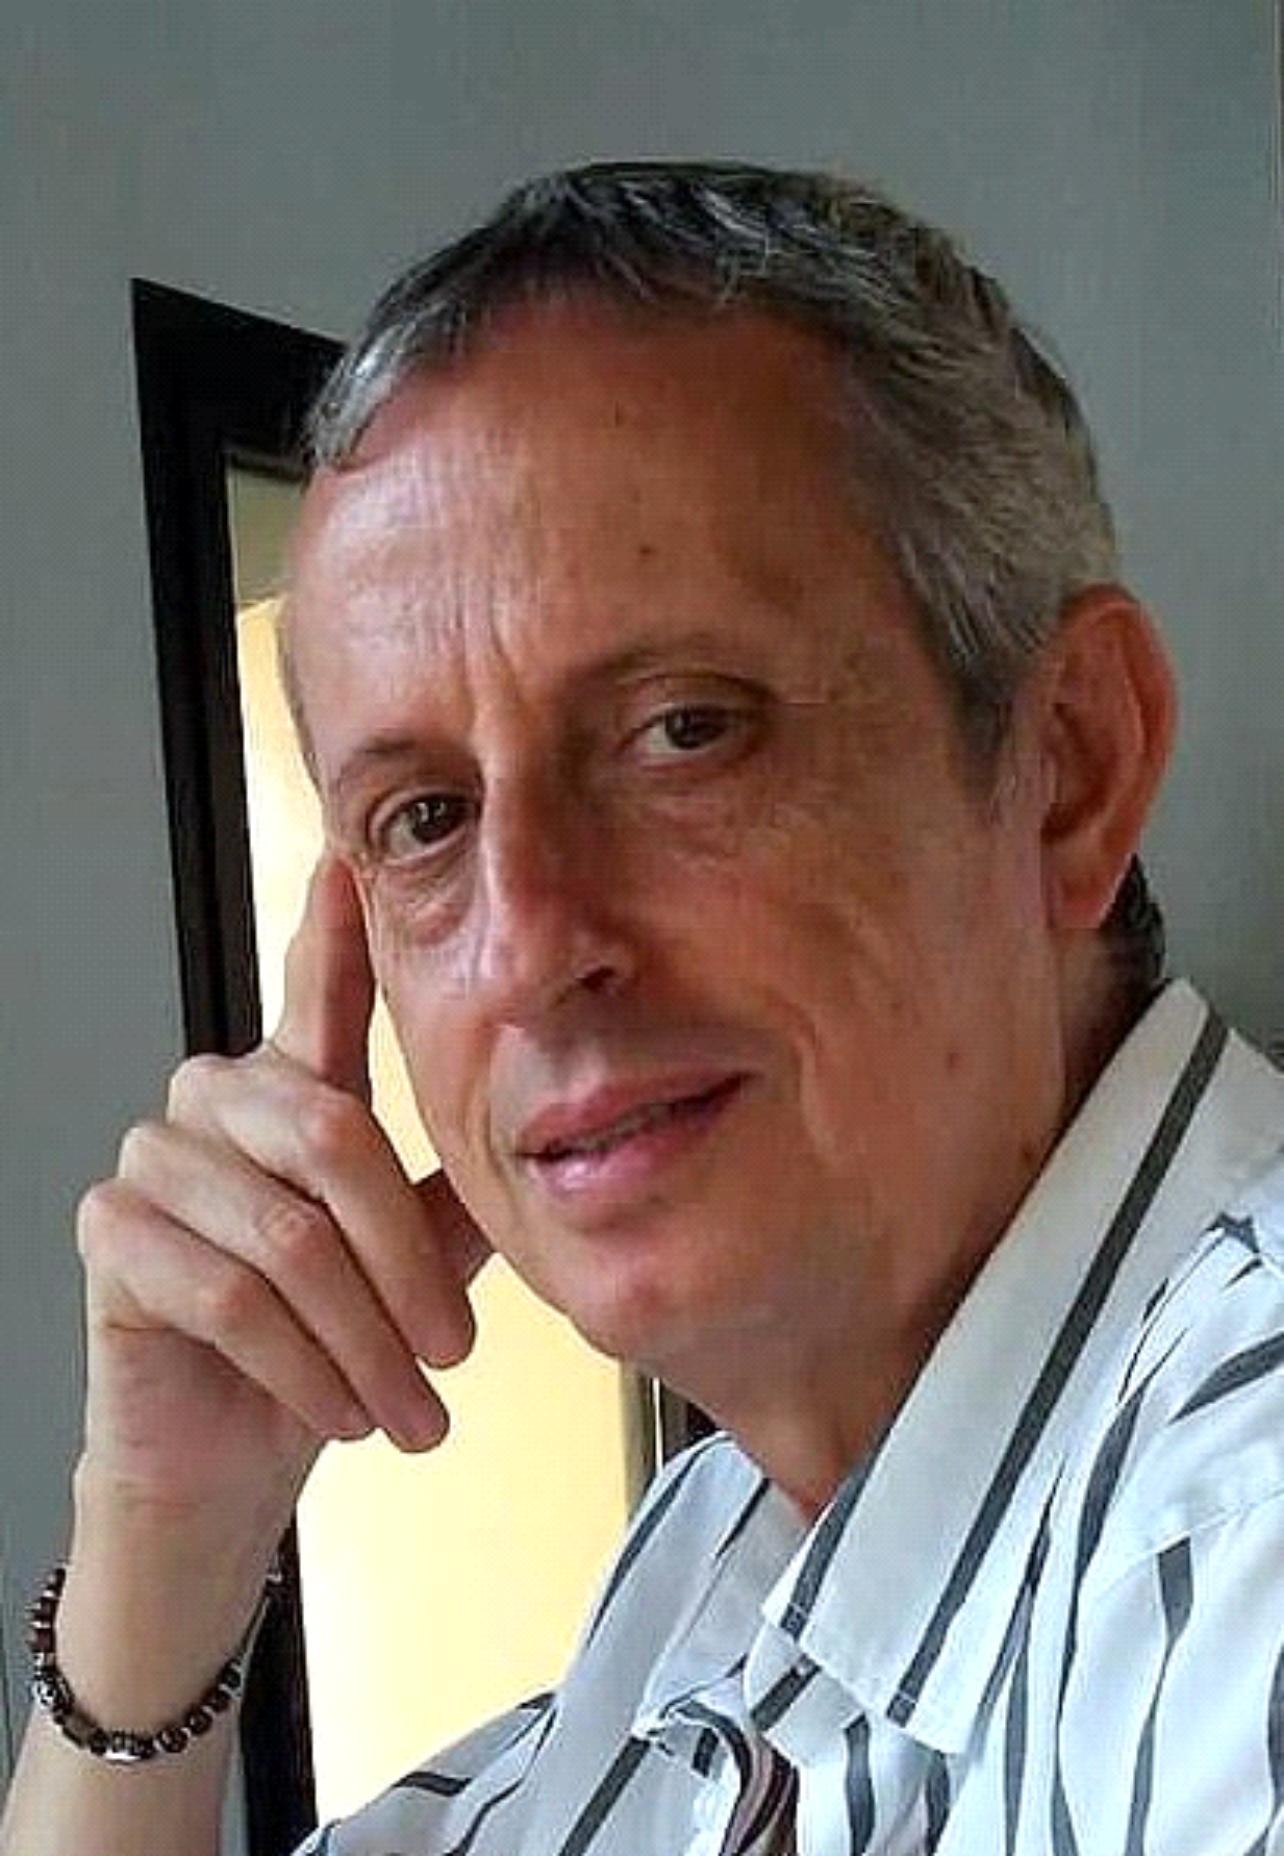 Diocleziano Galella